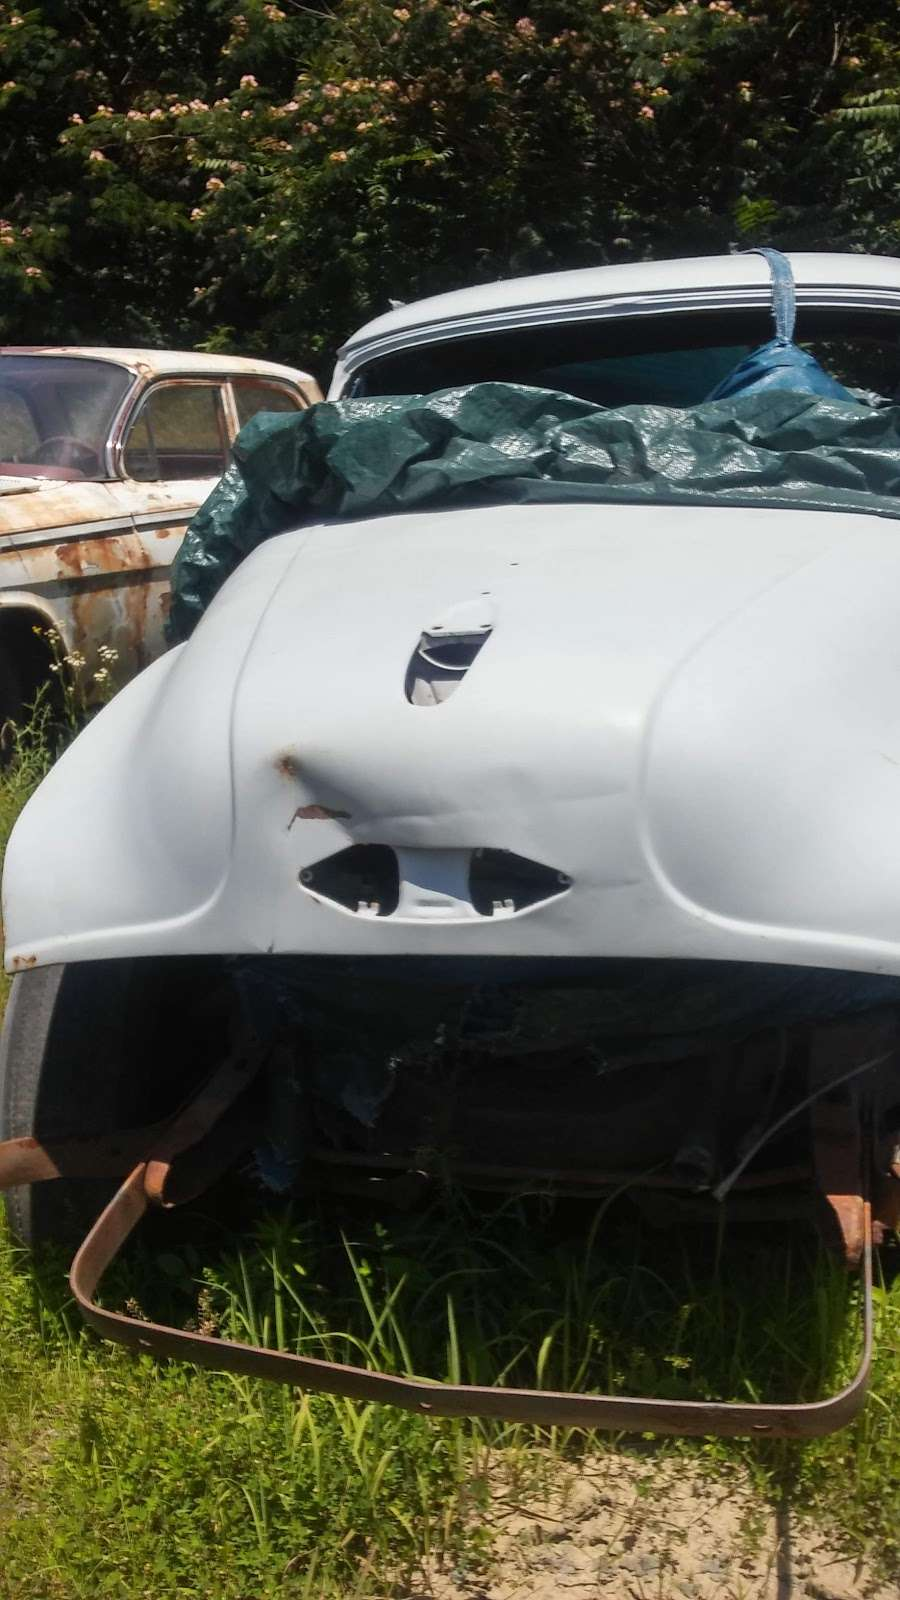 Kennys Auto & Quality Muffler - car repair  | Photo 7 of 10 | Address: 9984 3 Notch Rd, Troy, VA 22974, USA | Phone: (434) 589-5222